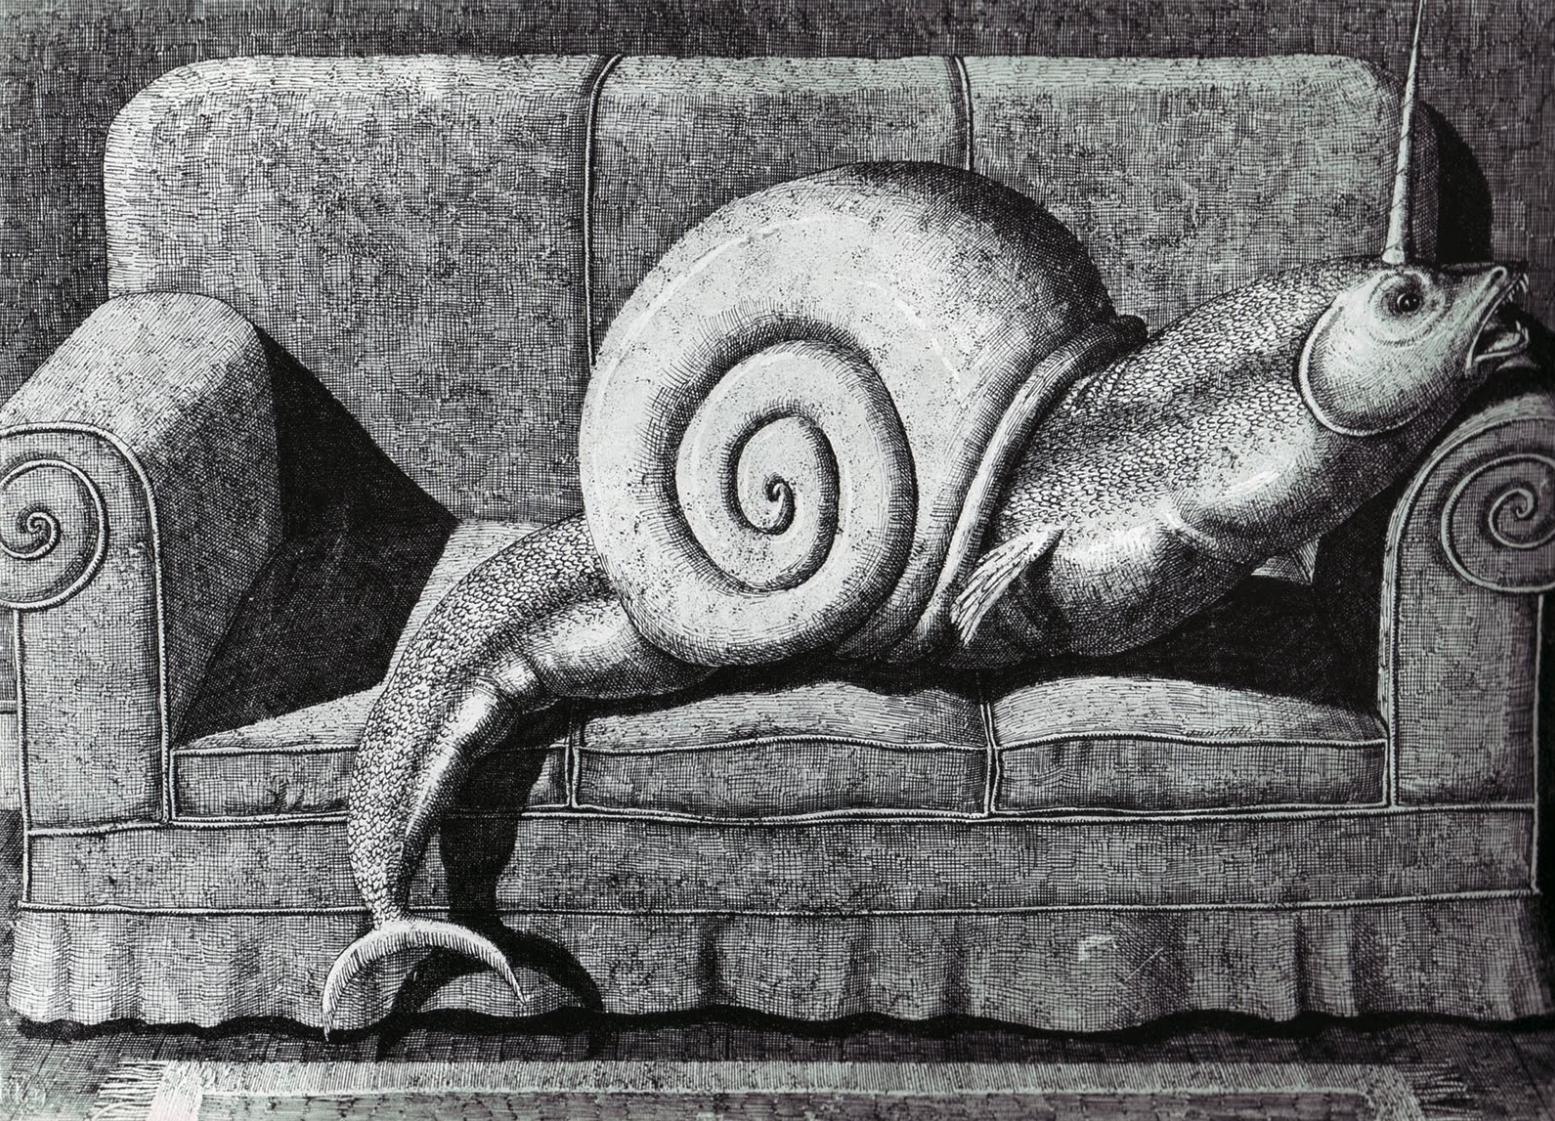 Edward Gorey Snail unicorn